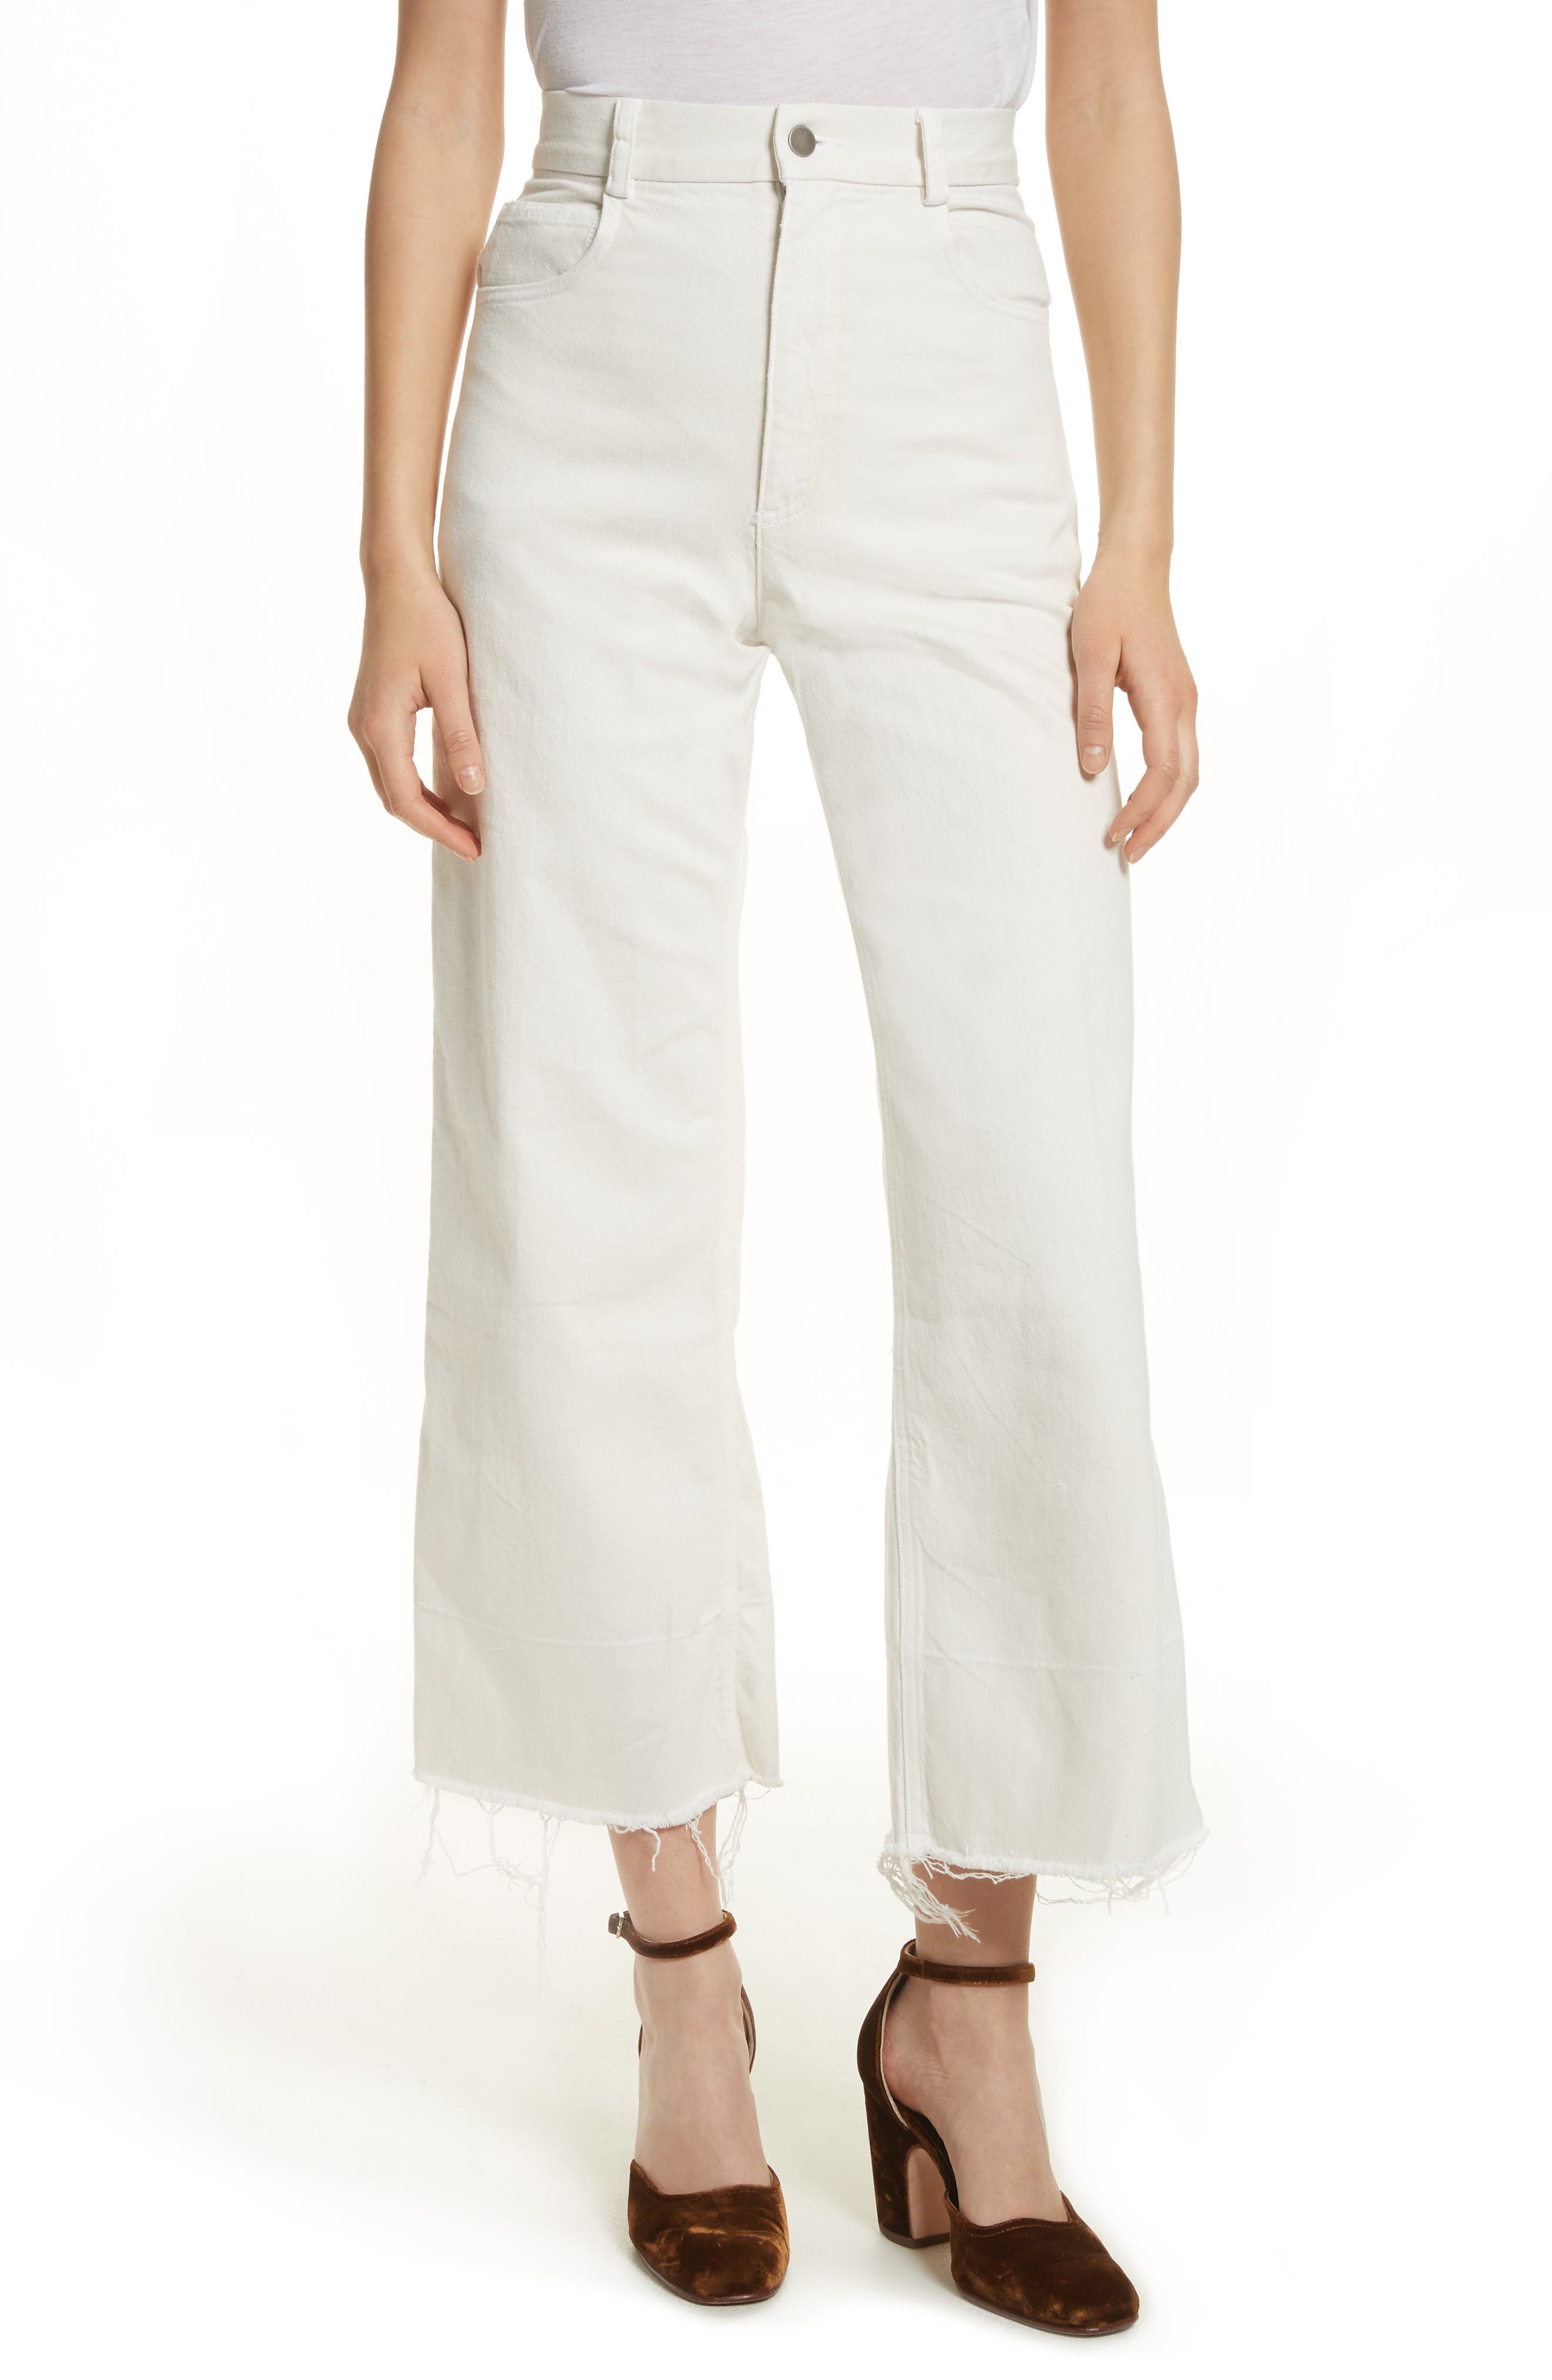 Rachey Comey Legion Crop Wide Leg Pants,                             Main thumbnail 1, color,                             DIRTY WHITE